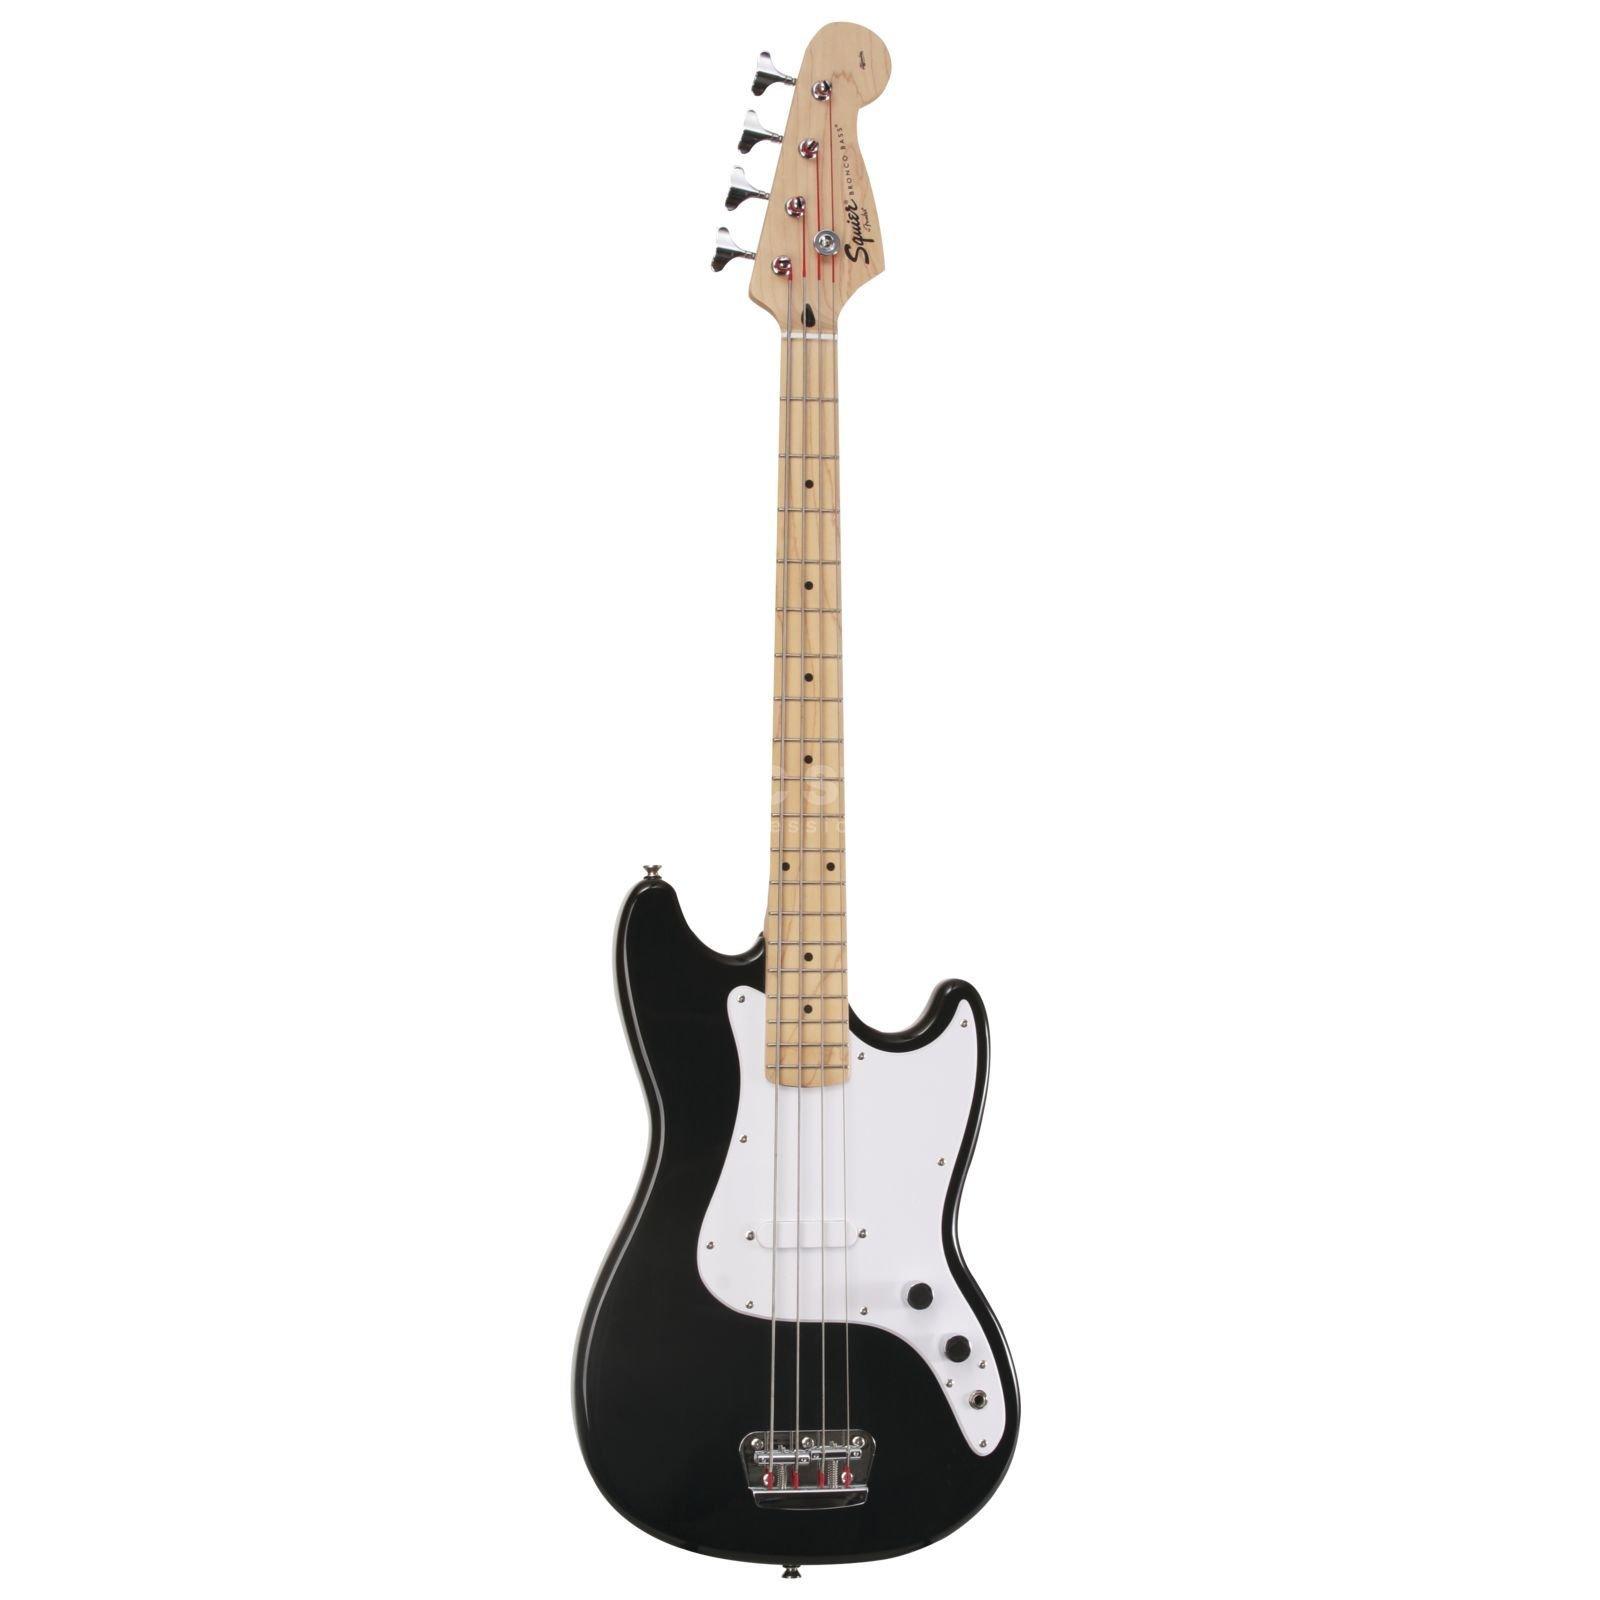 Squier Bronco Bass Black